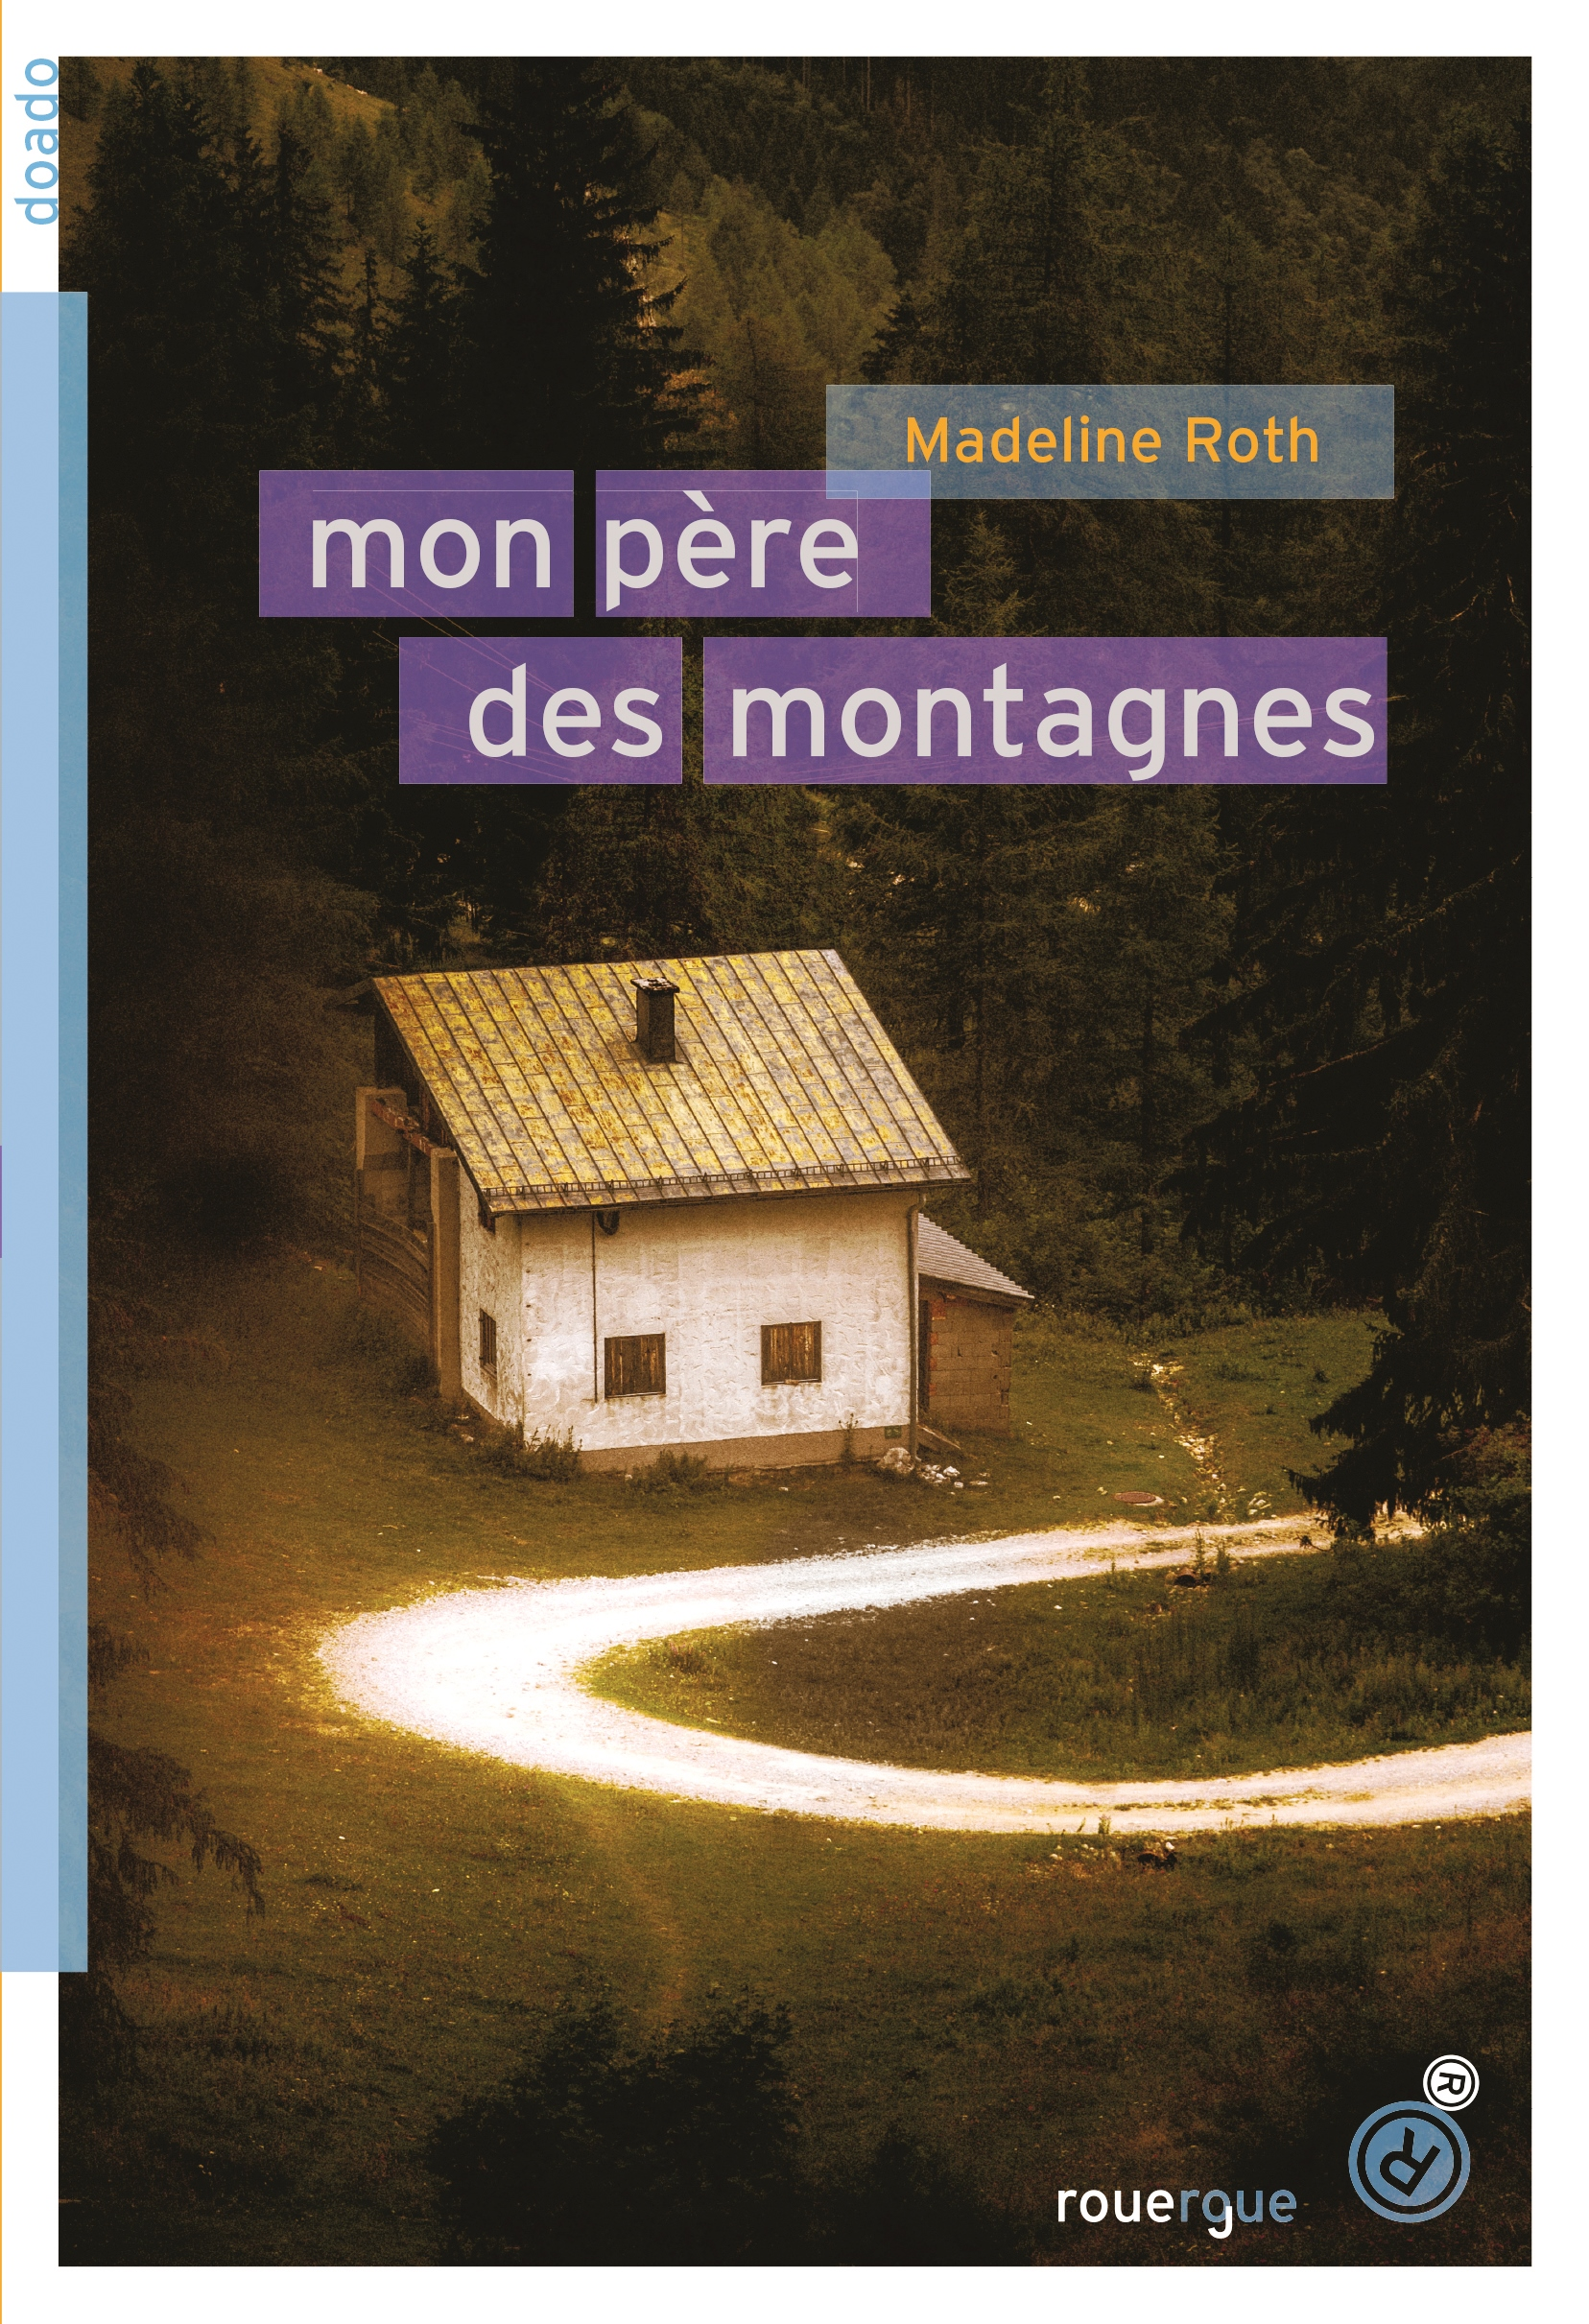 Pere-montage-CVBAT-2019.indd